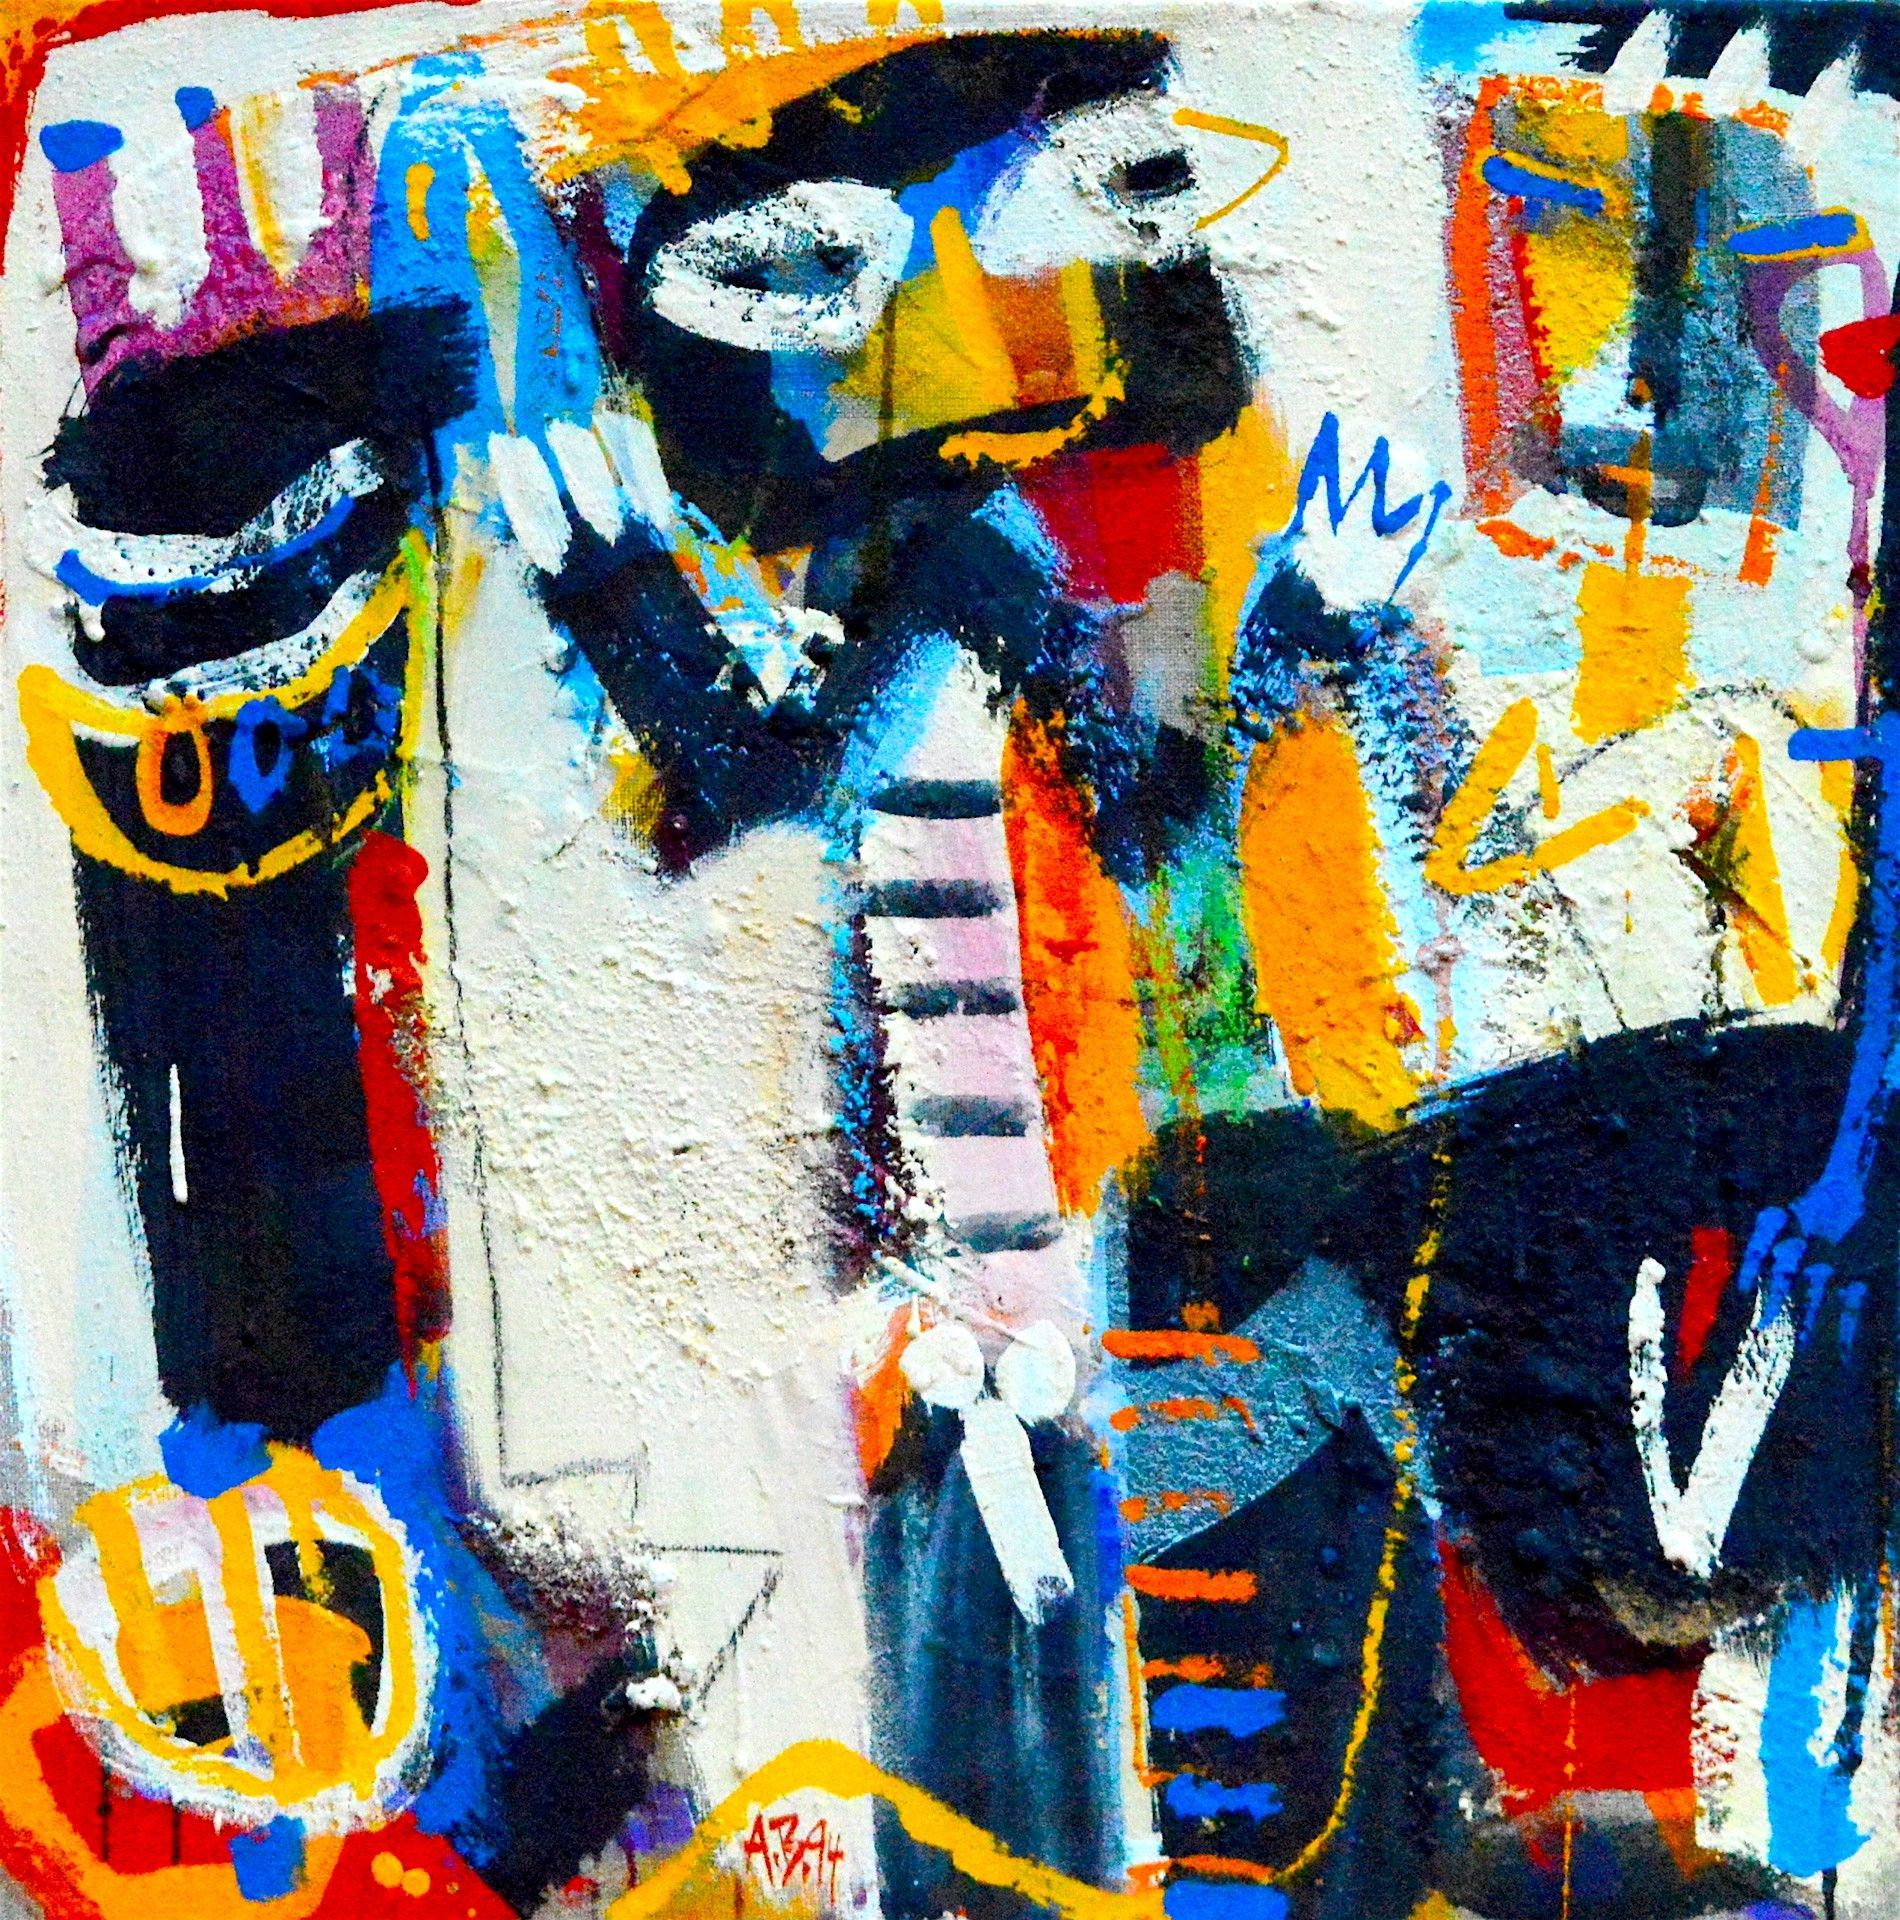 Bischoff, Annette, Kunst, Galerie Voigt, Nürnberg